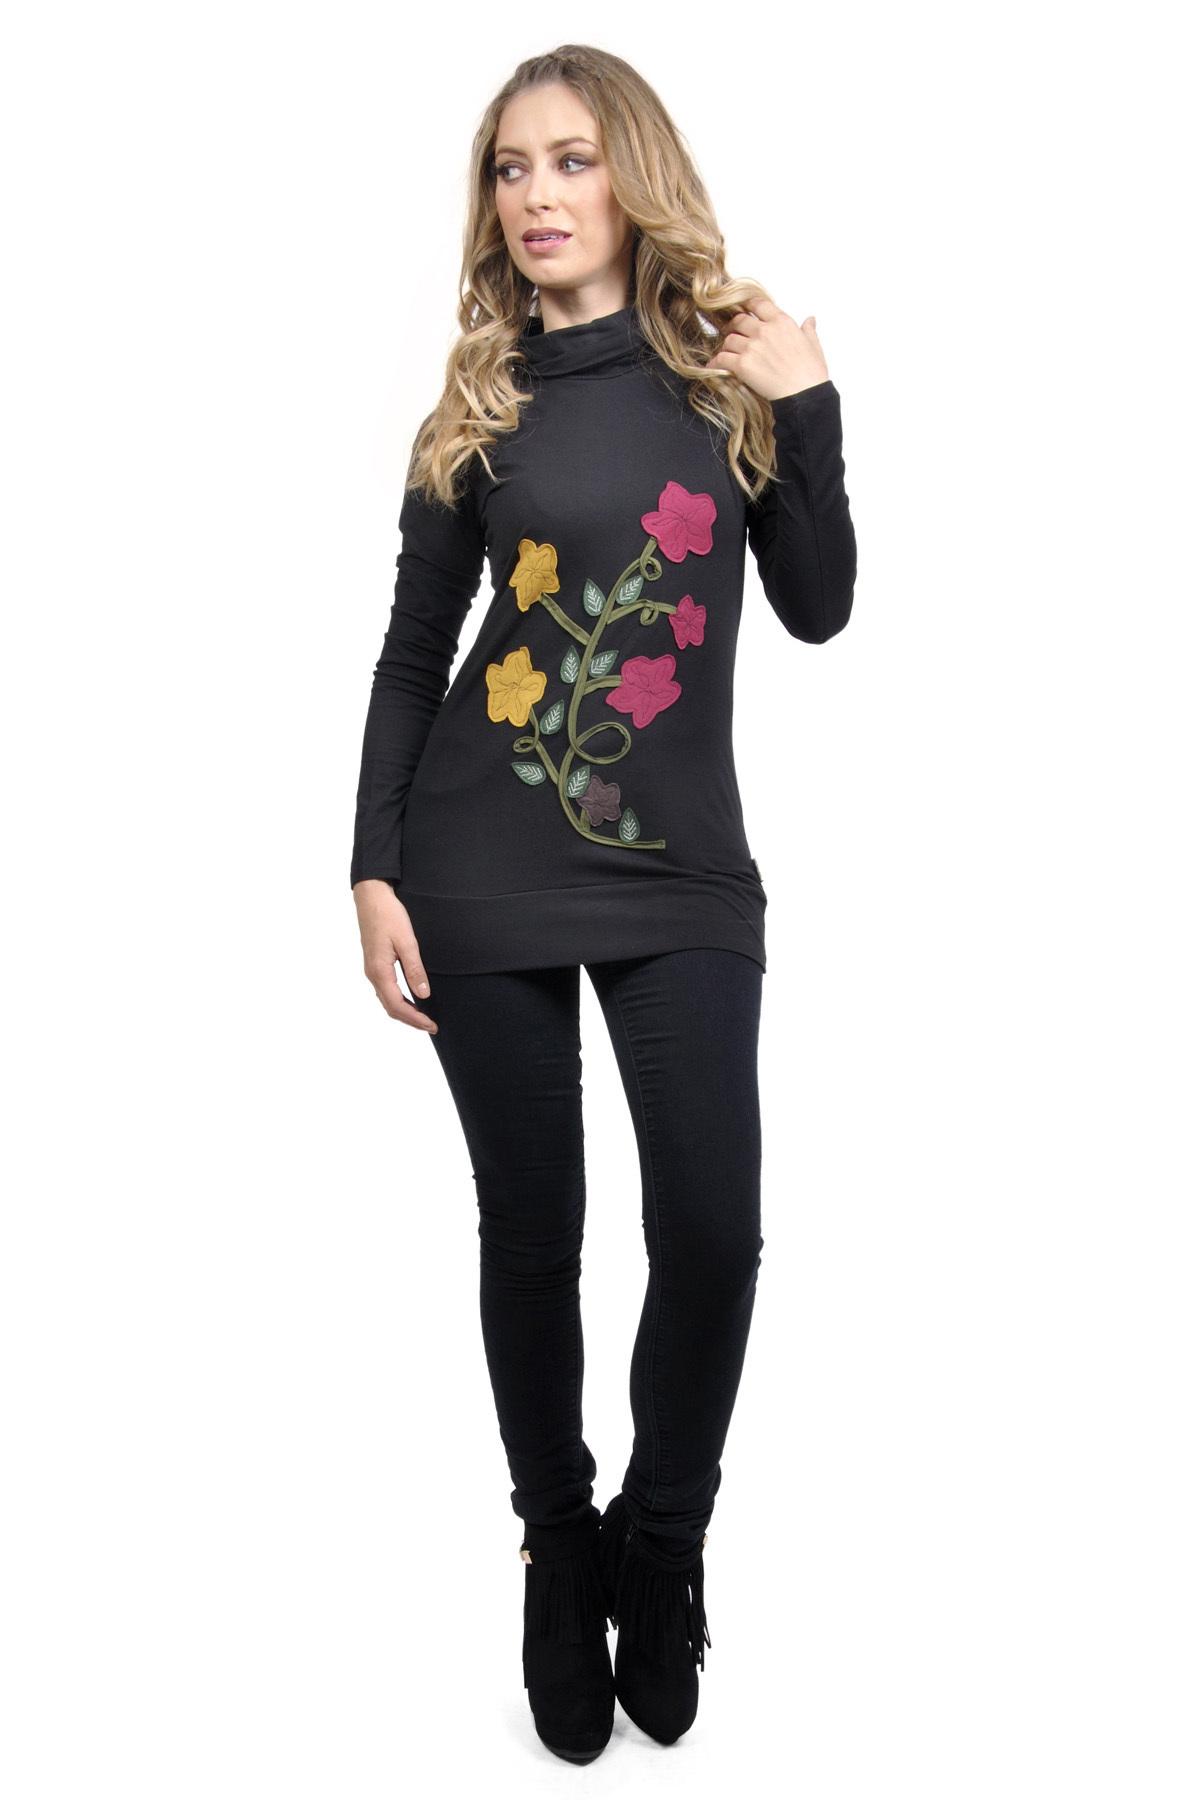 Savage Culture: Chic Rosette Martini Sweater Tunic Olivia (1 Left!)